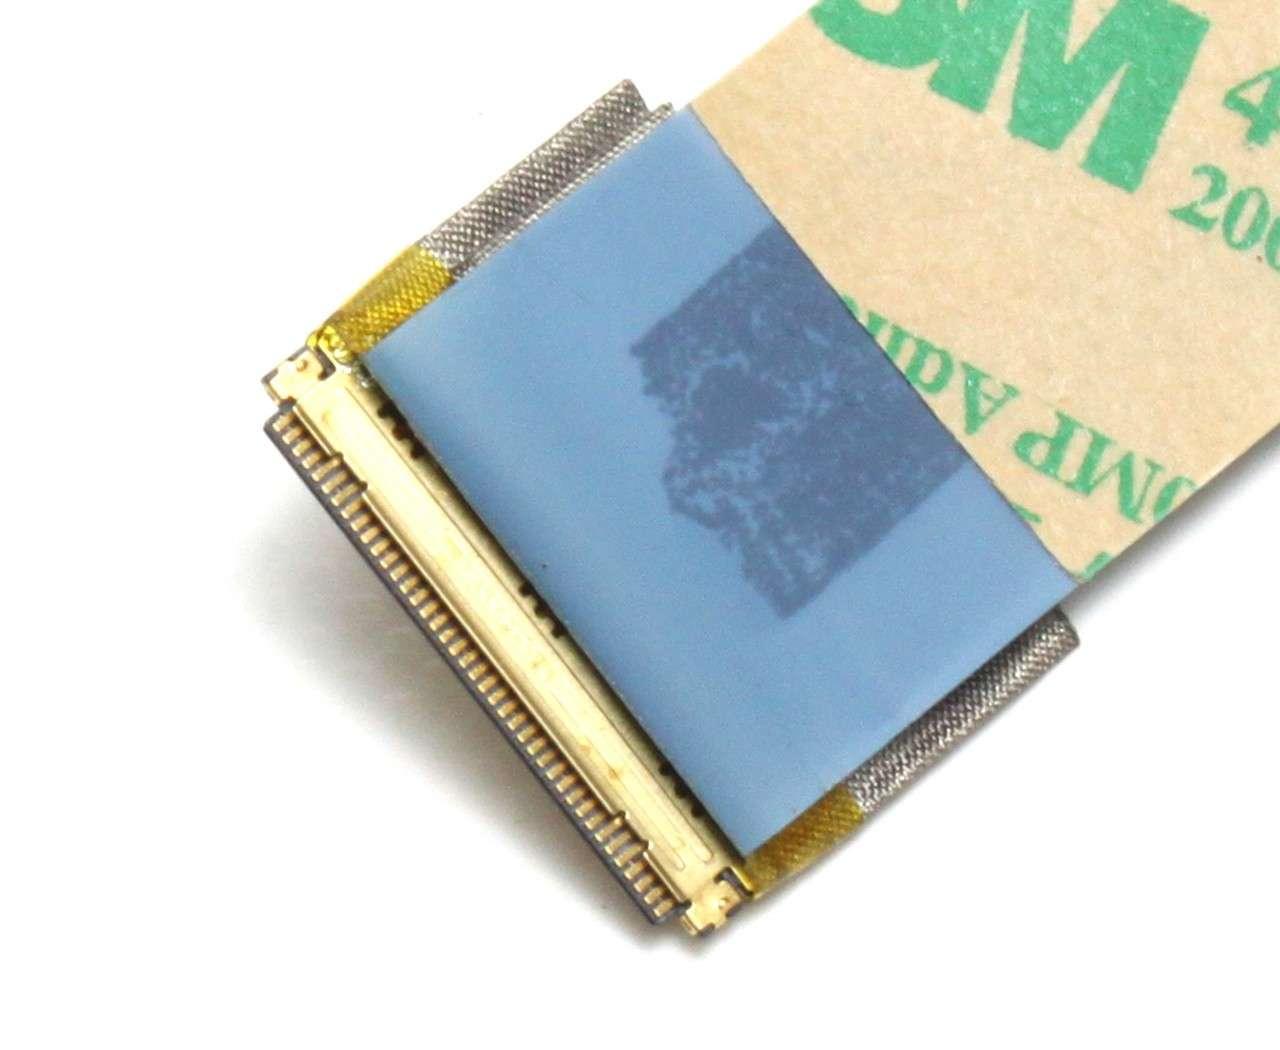 Cablu video LVDS Asus N73JF imagine powerlaptop.ro 2021